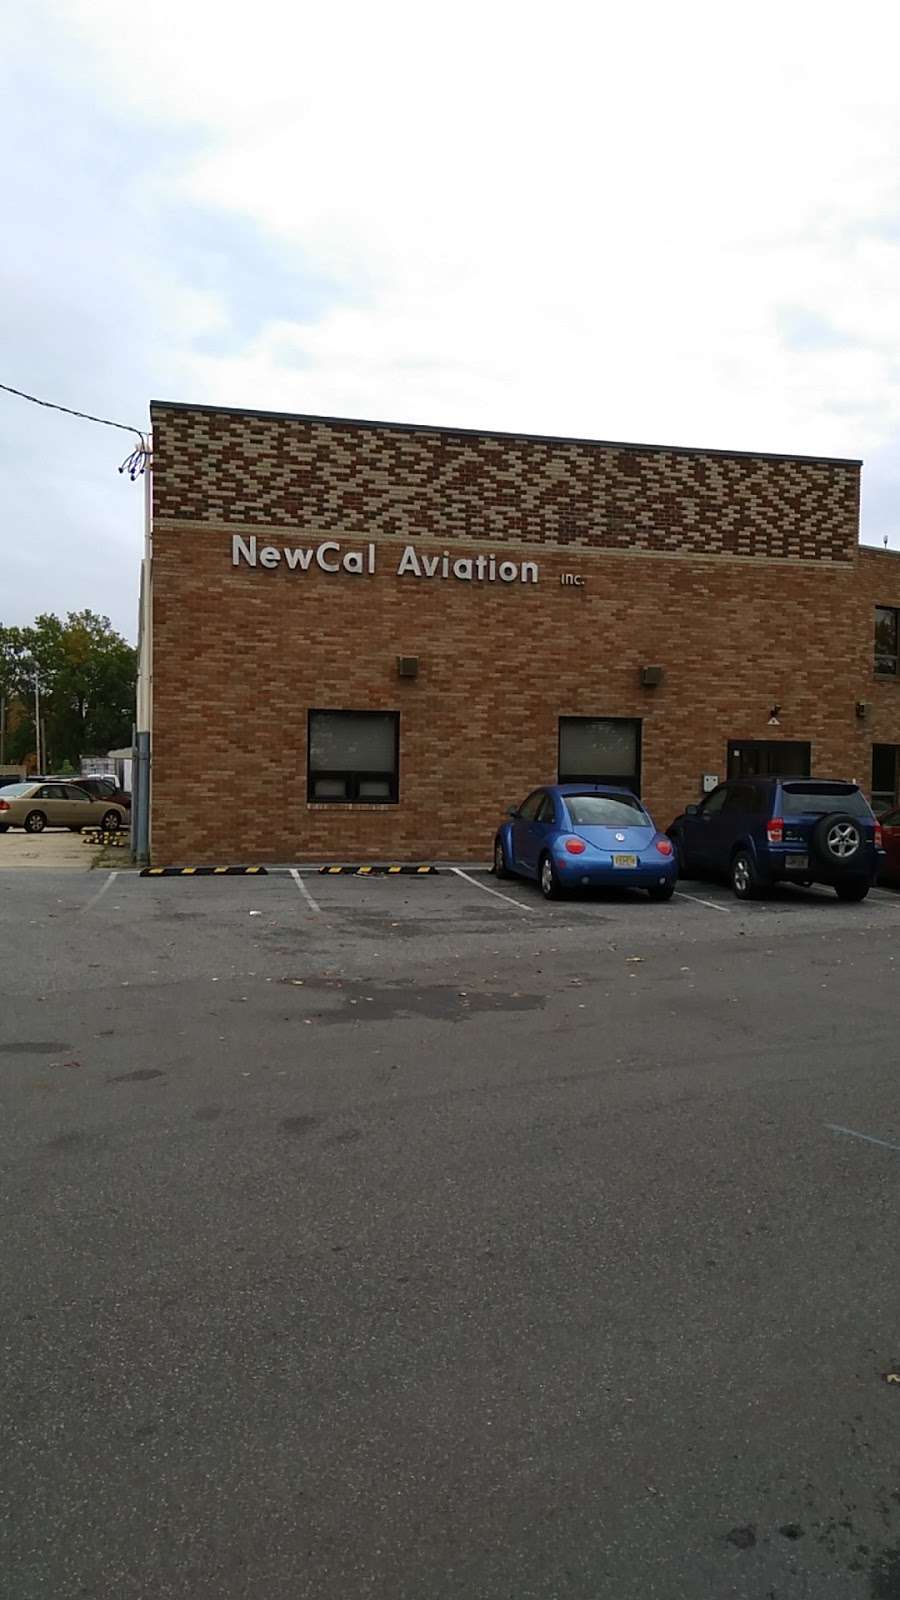 Newcal Aviation - store  | Photo 2 of 2 | Address: 14 Riser Rd, Little Ferry, NJ 07643, USA | Phone: (201) 440-1990